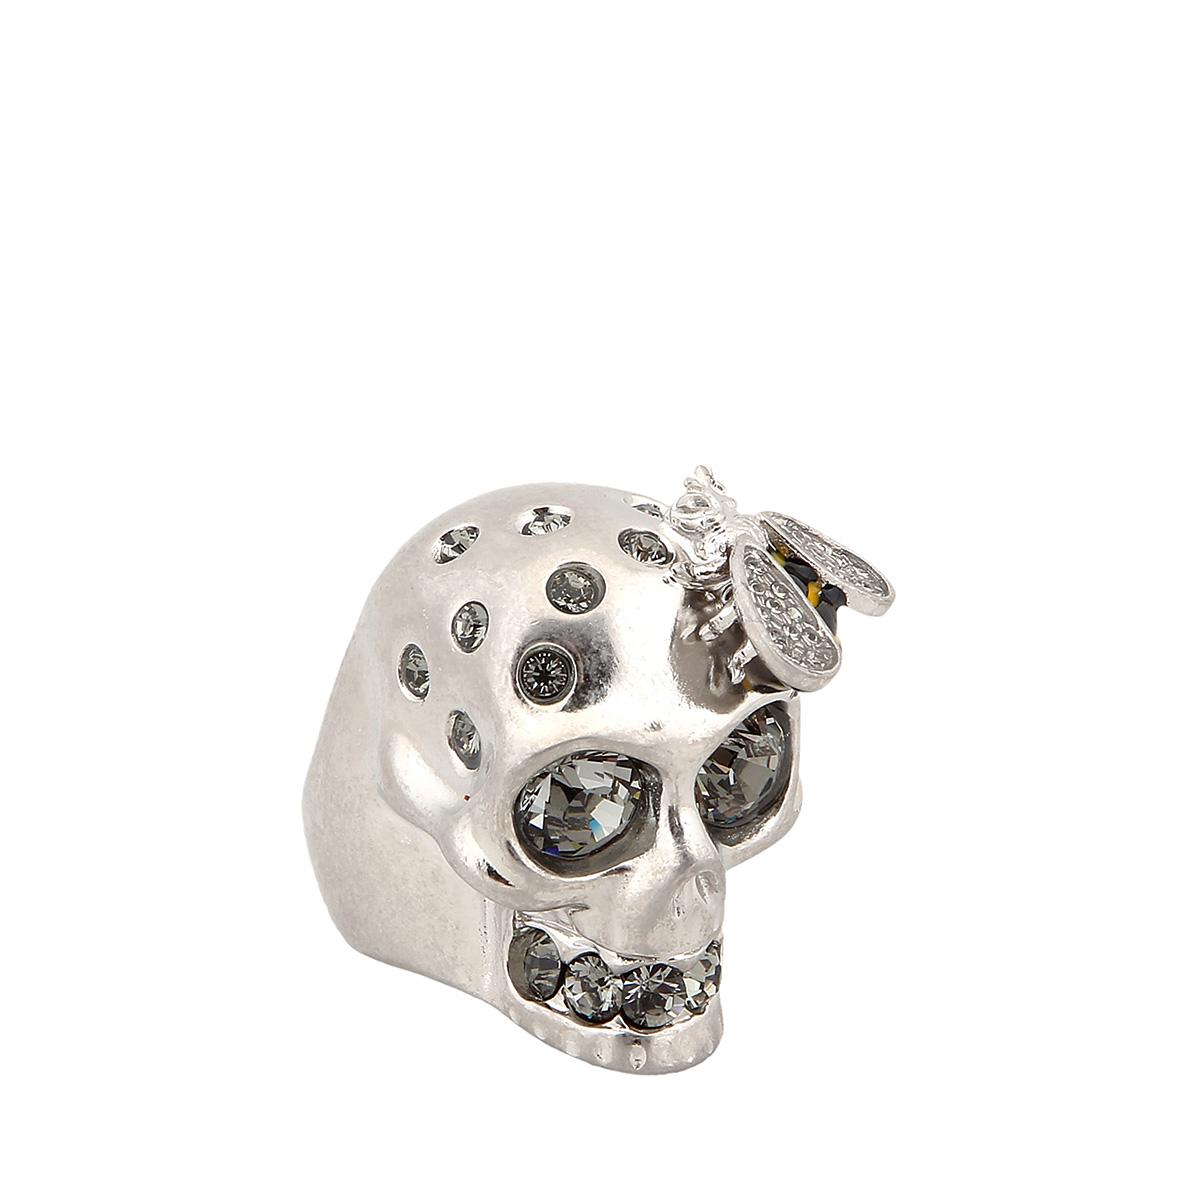 ALEXANDER MCQUEEN亚历山大麦昆 金属材质骷髅头样式女士戒指